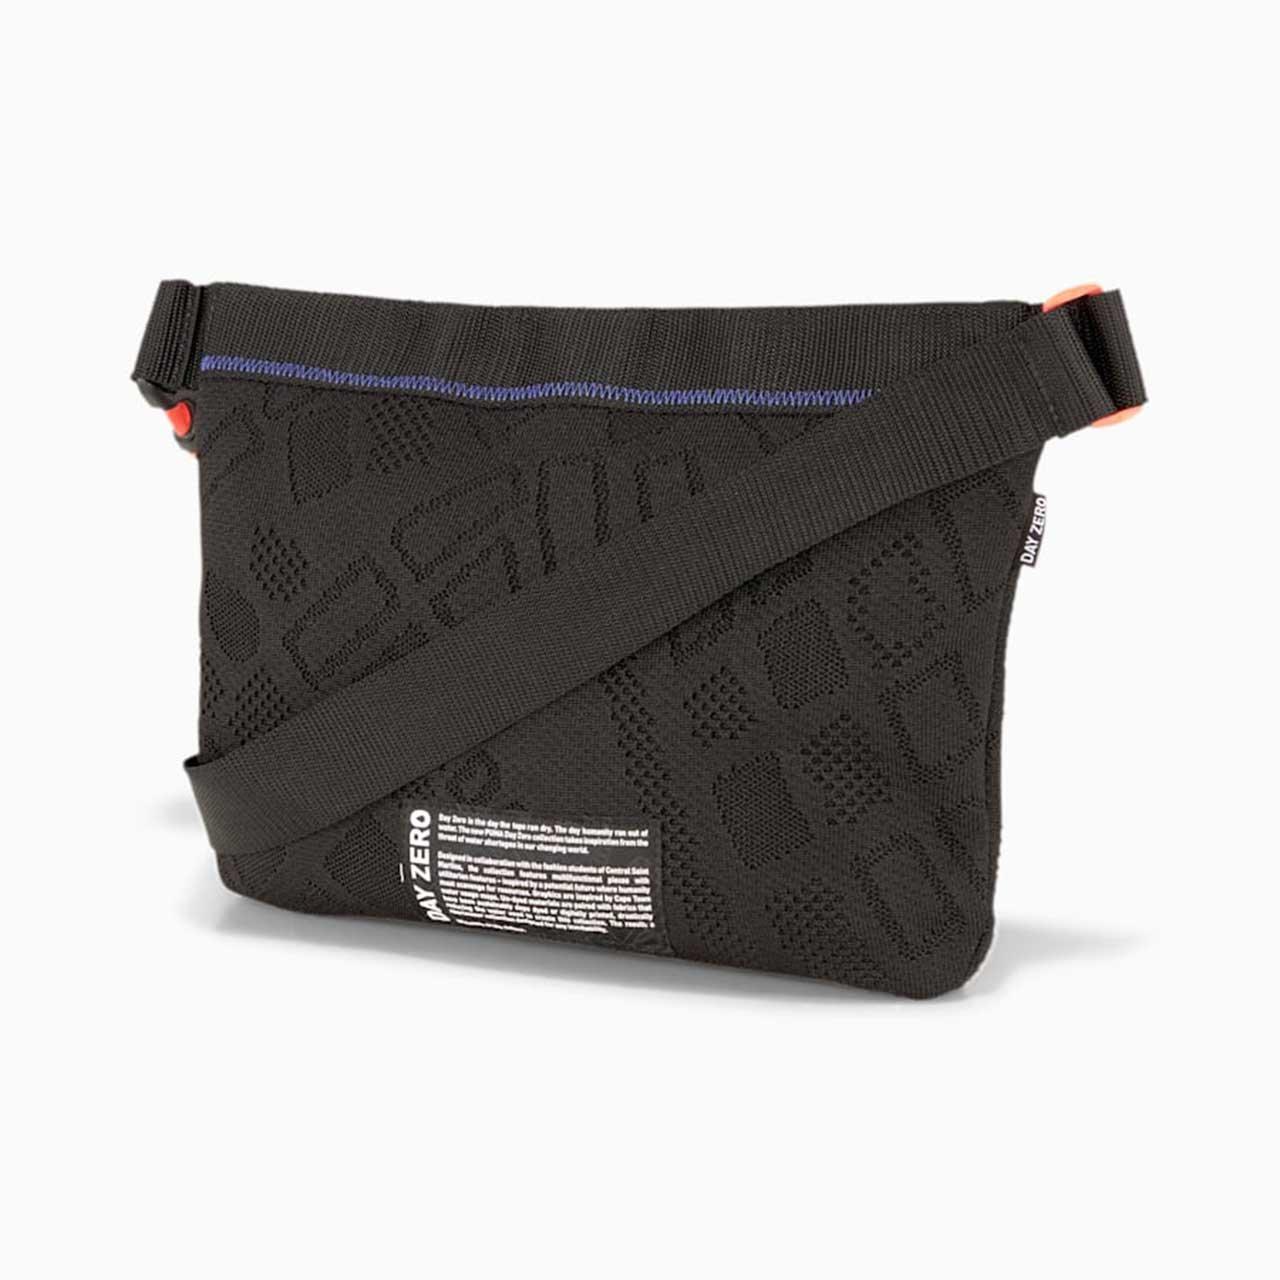 PUMA × Central Saint Martins Knit Waist Bag